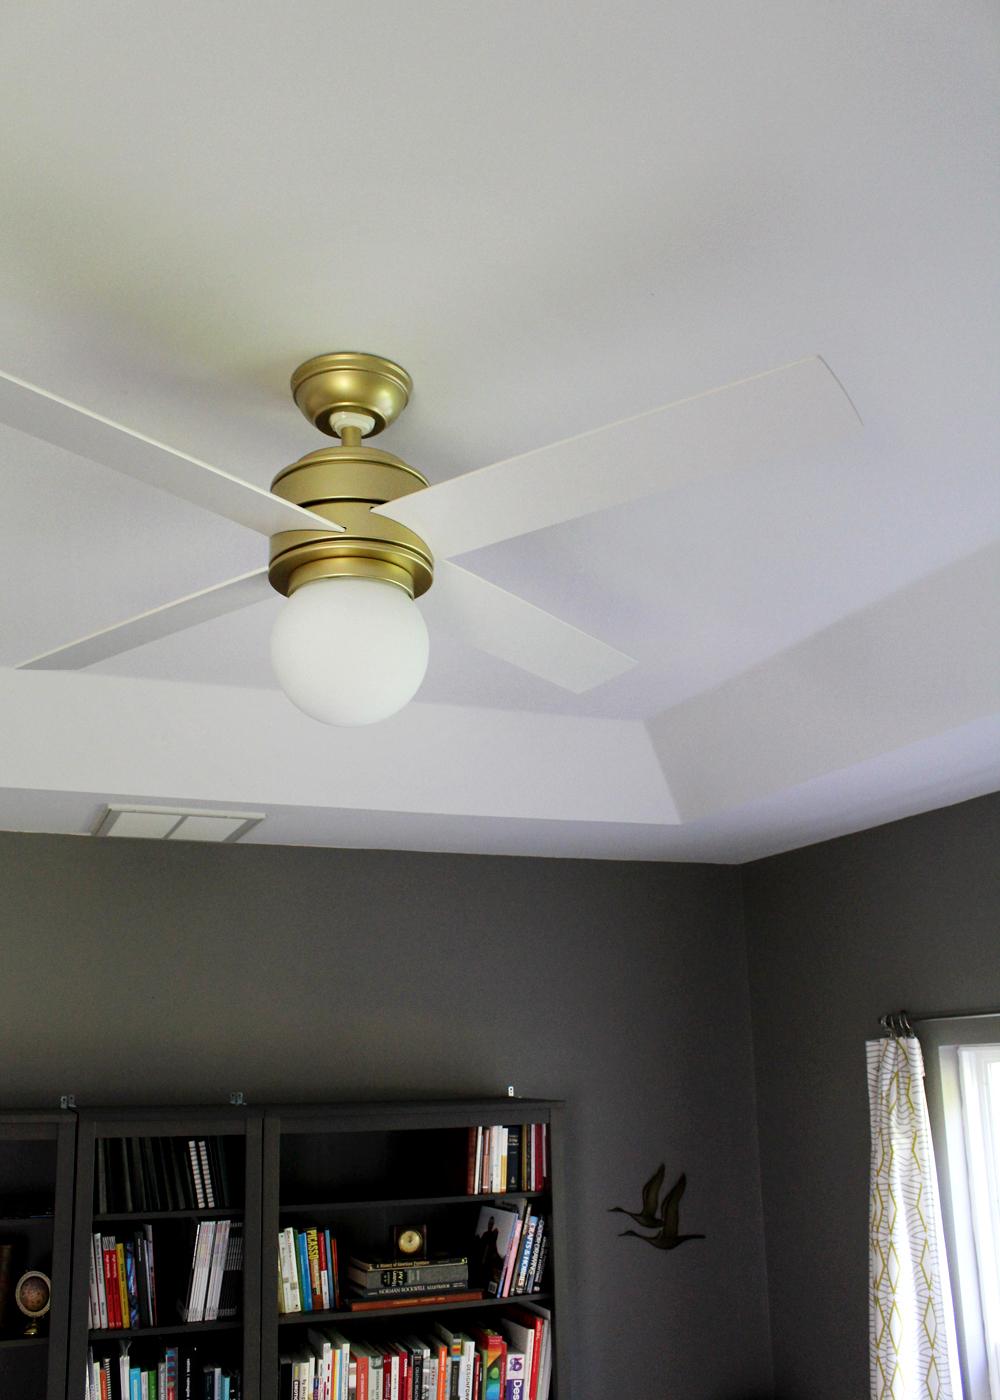 Hunter Fan Hepburn: a modern ceiling fan upgrade for under $200   tag&tibby